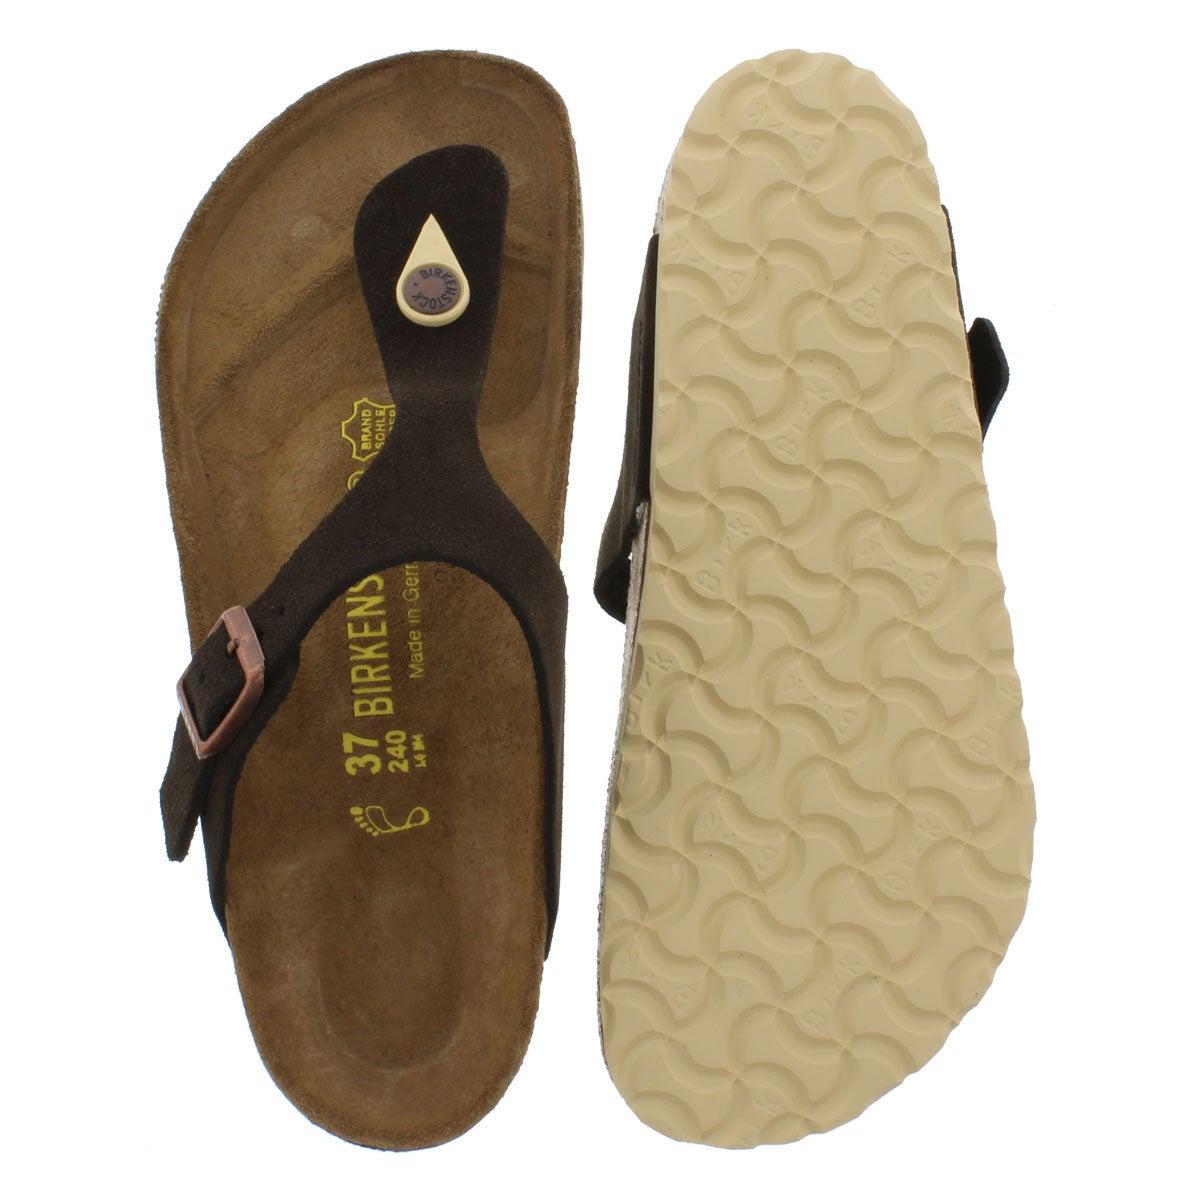 Lds Gizeh mocha suede thong sandal